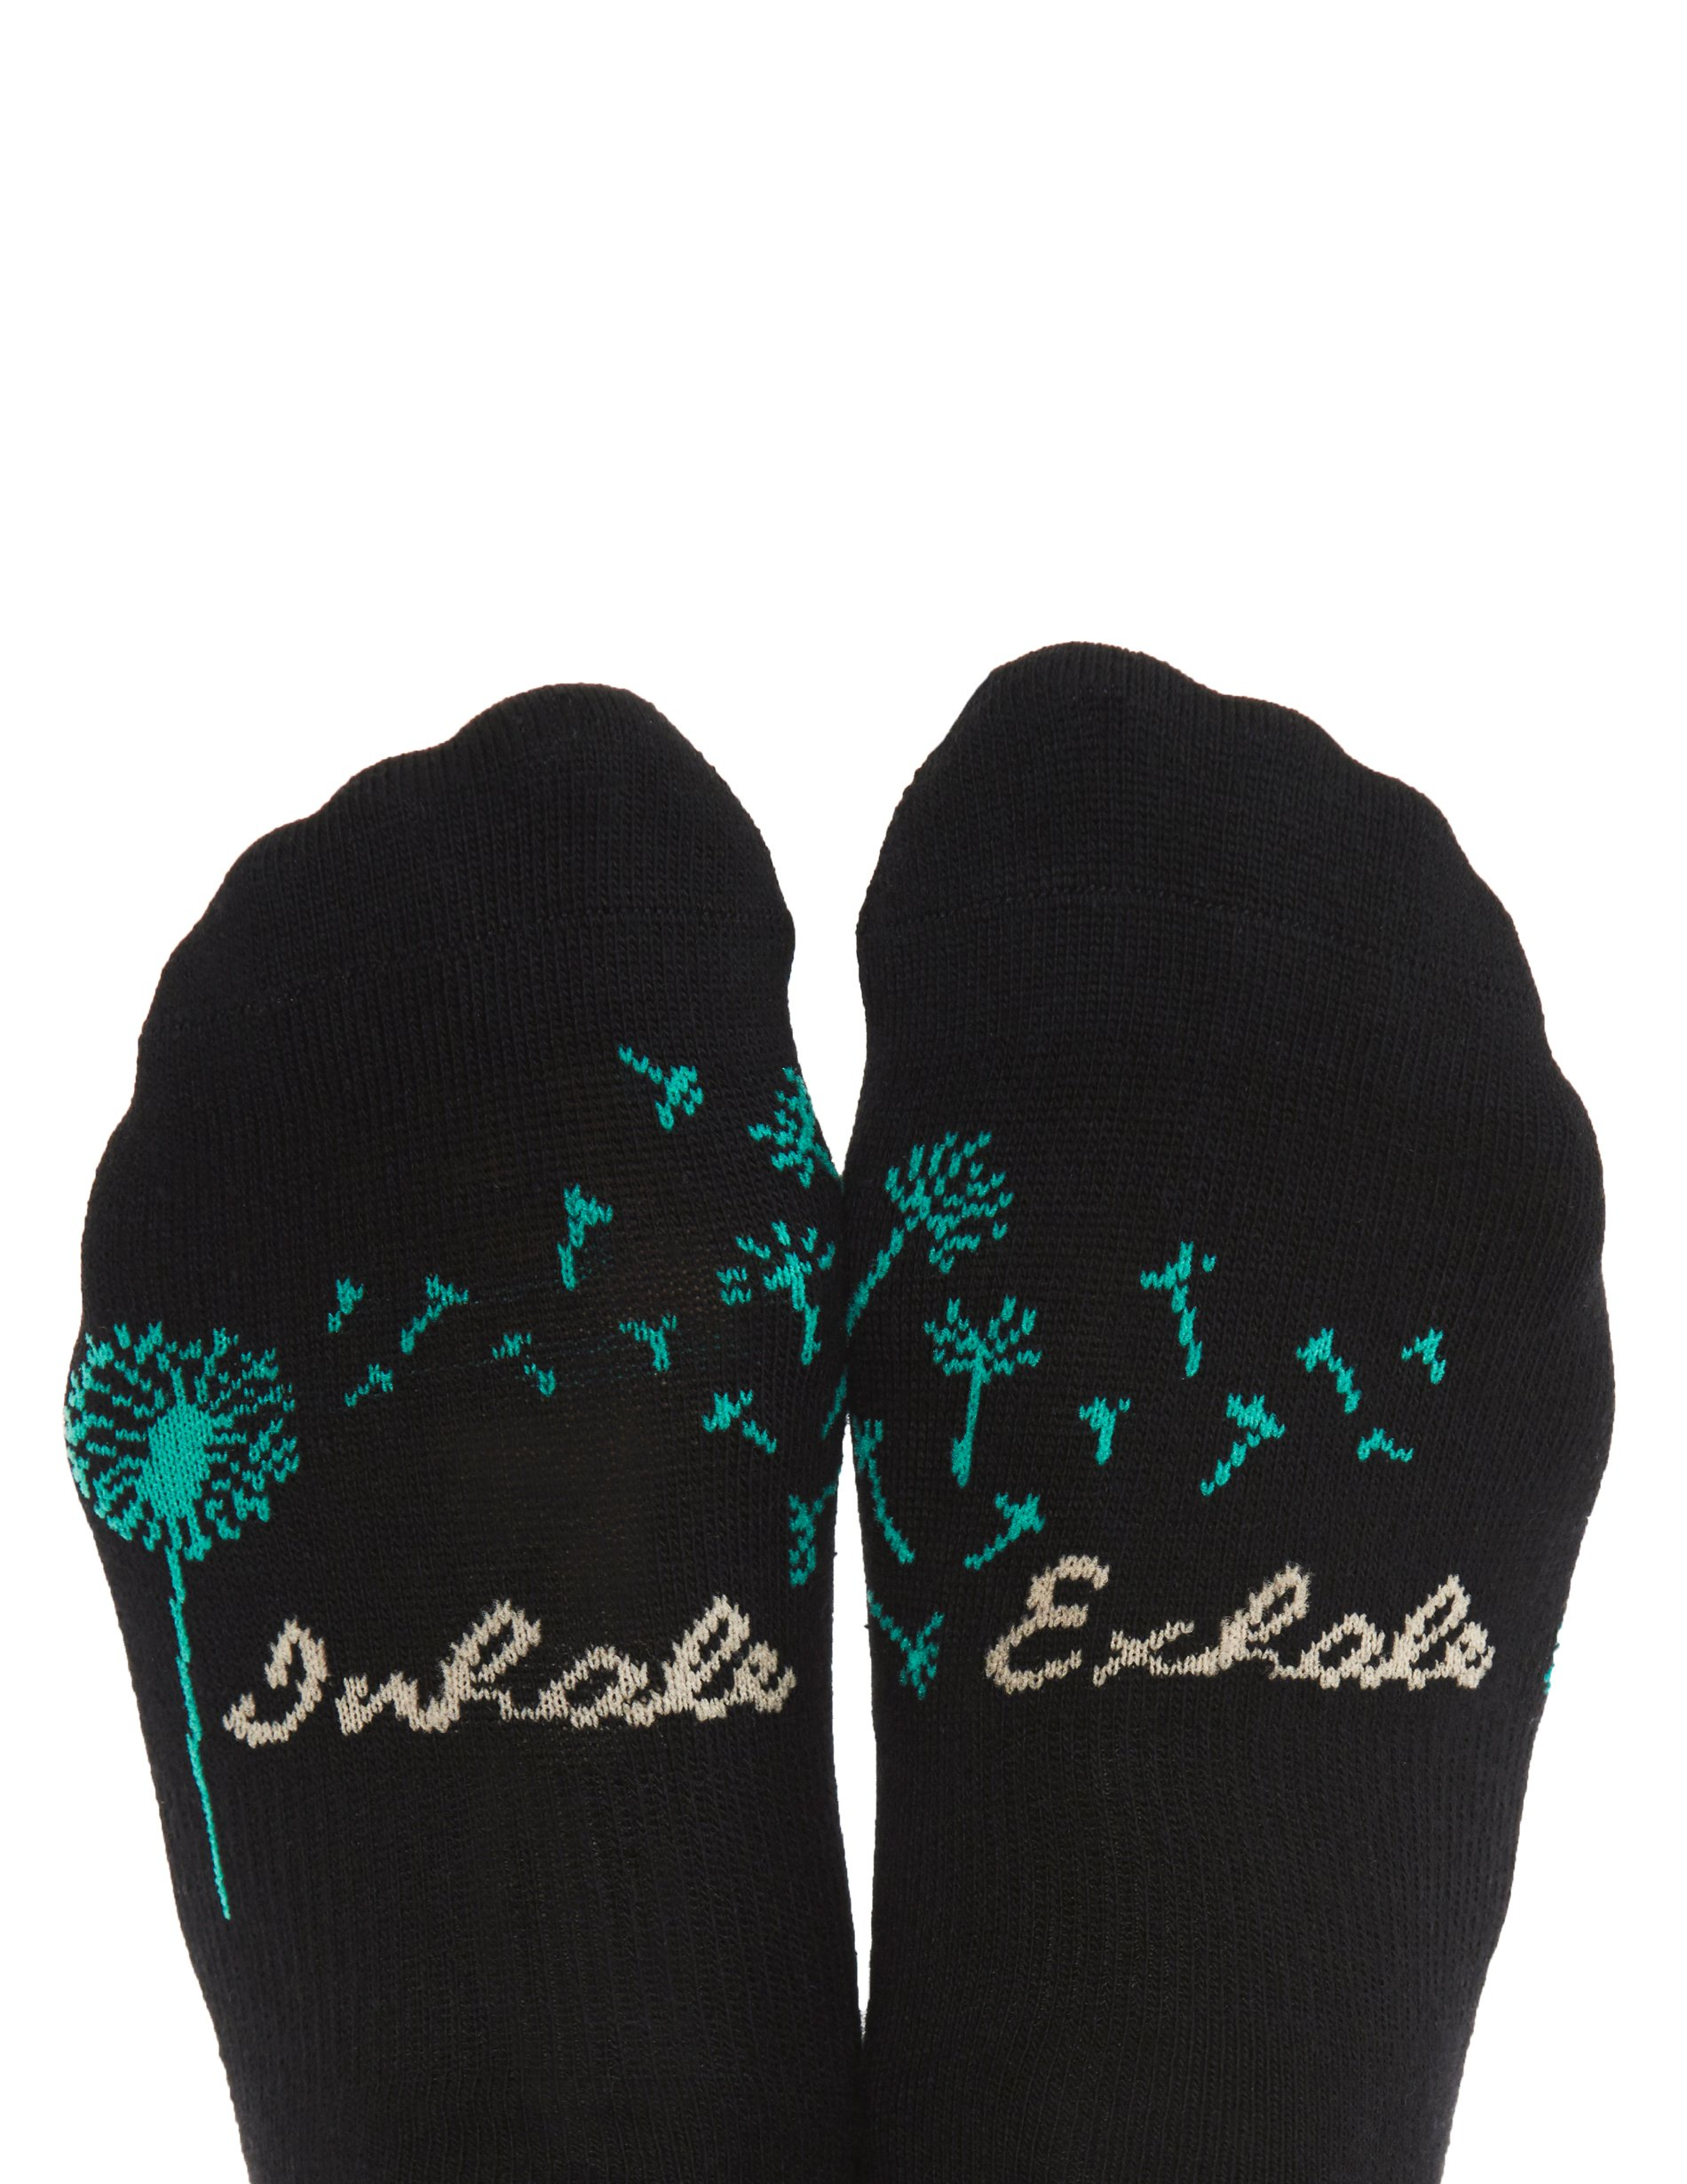 Toe Talk INHALE EXHALE Non Slip Grip Sock for Pilates Yoga Barre Tai Chi Dance Meditation & Mindful Living Fine Knit Sock (1, Sock Set)